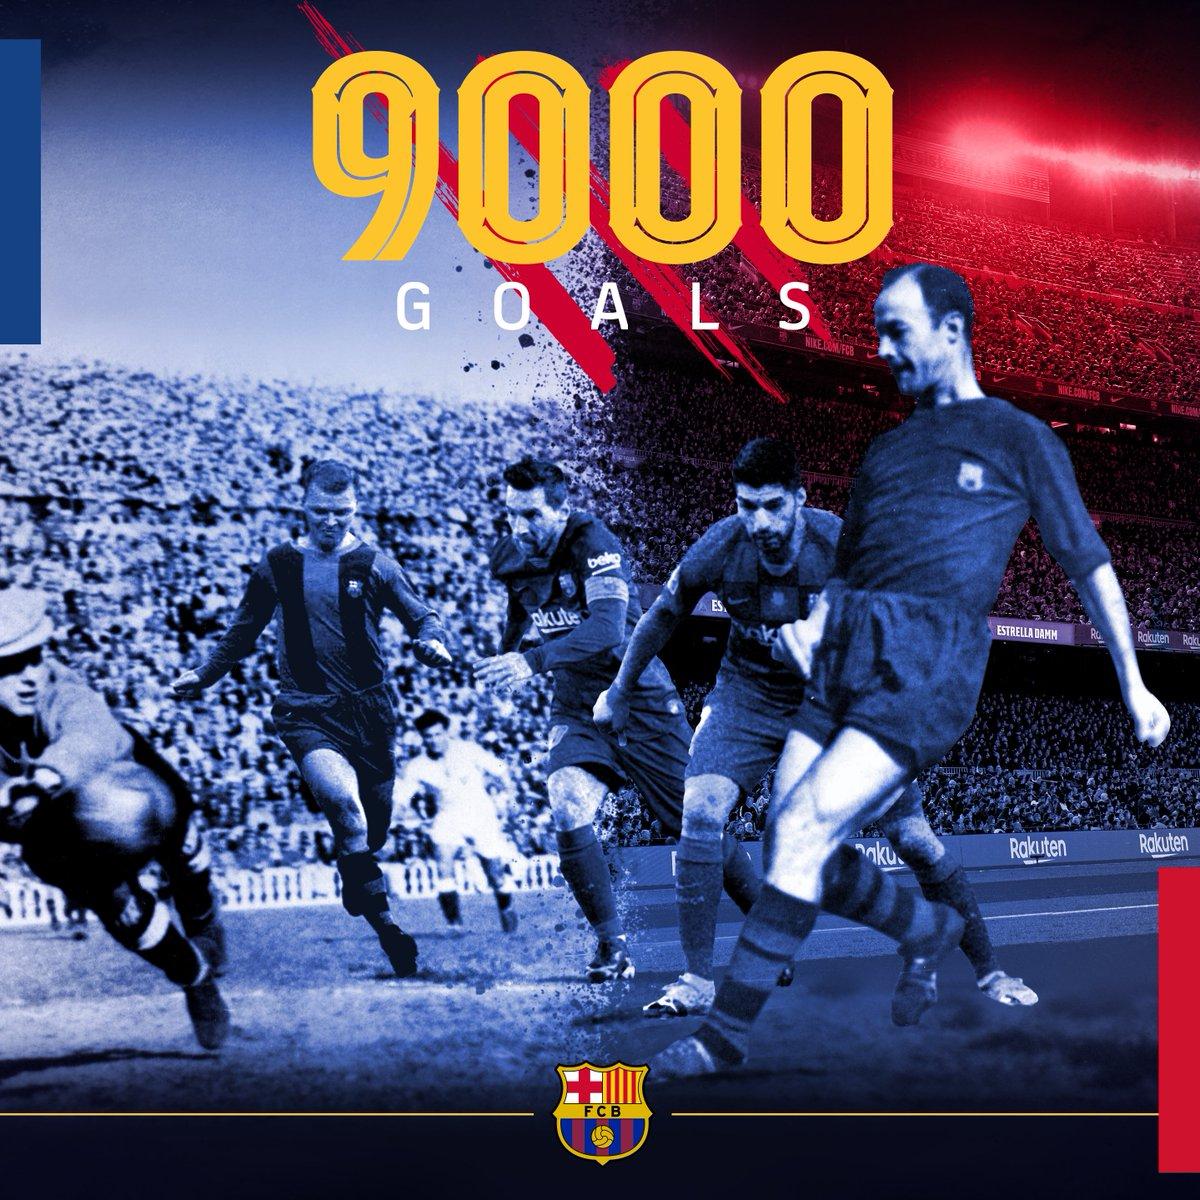 M I L E S T O N E !  That strike by @ANSUFATI was the 9️⃣,0️⃣0️⃣0️⃣th goal in Barça history!  💪🔵🔴 https://t.co/J6jB3w6gMx